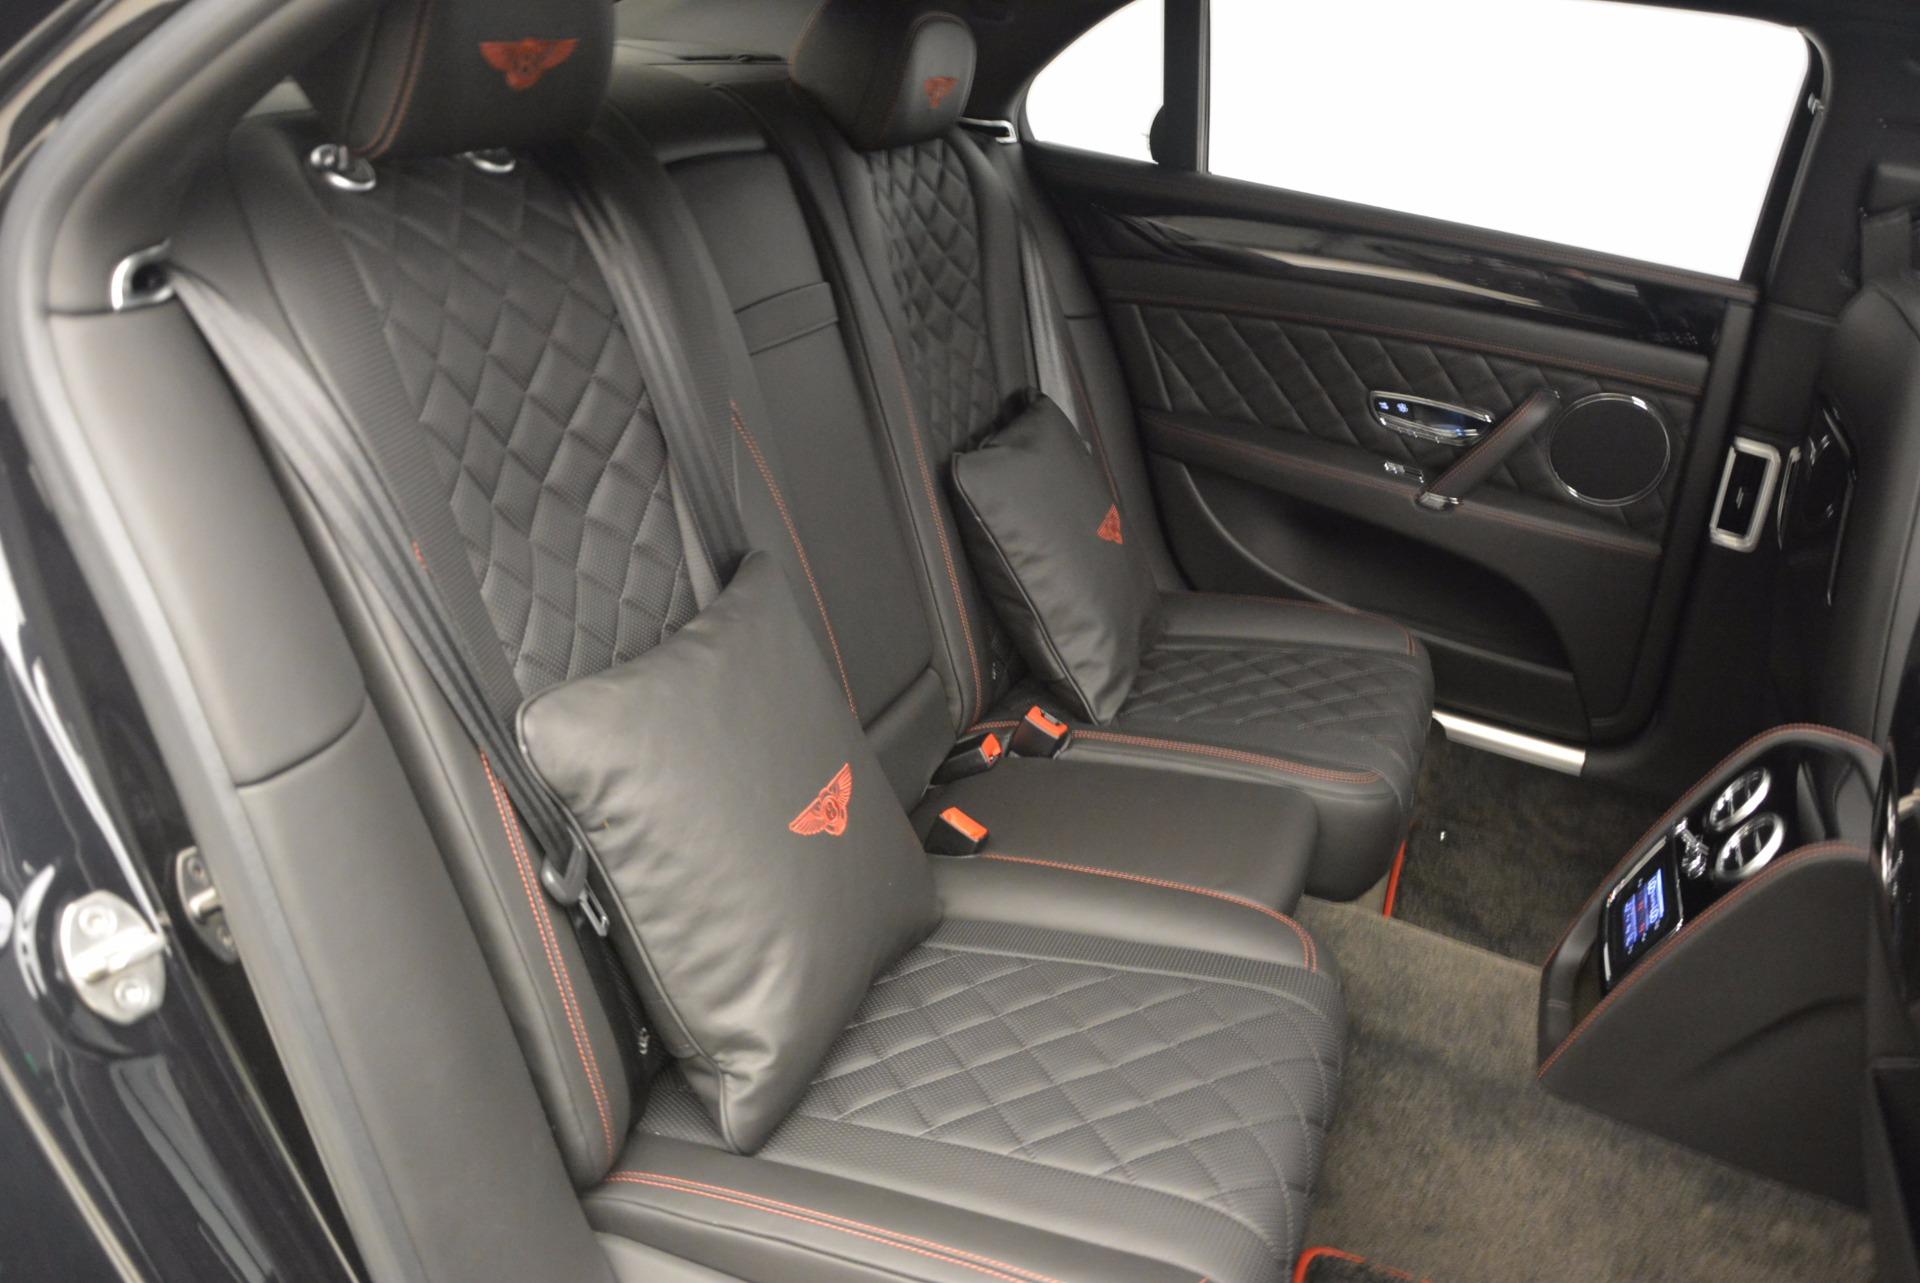 Used 2017 Bentley Flying Spur V8 S For Sale In Westport, CT 732_p23